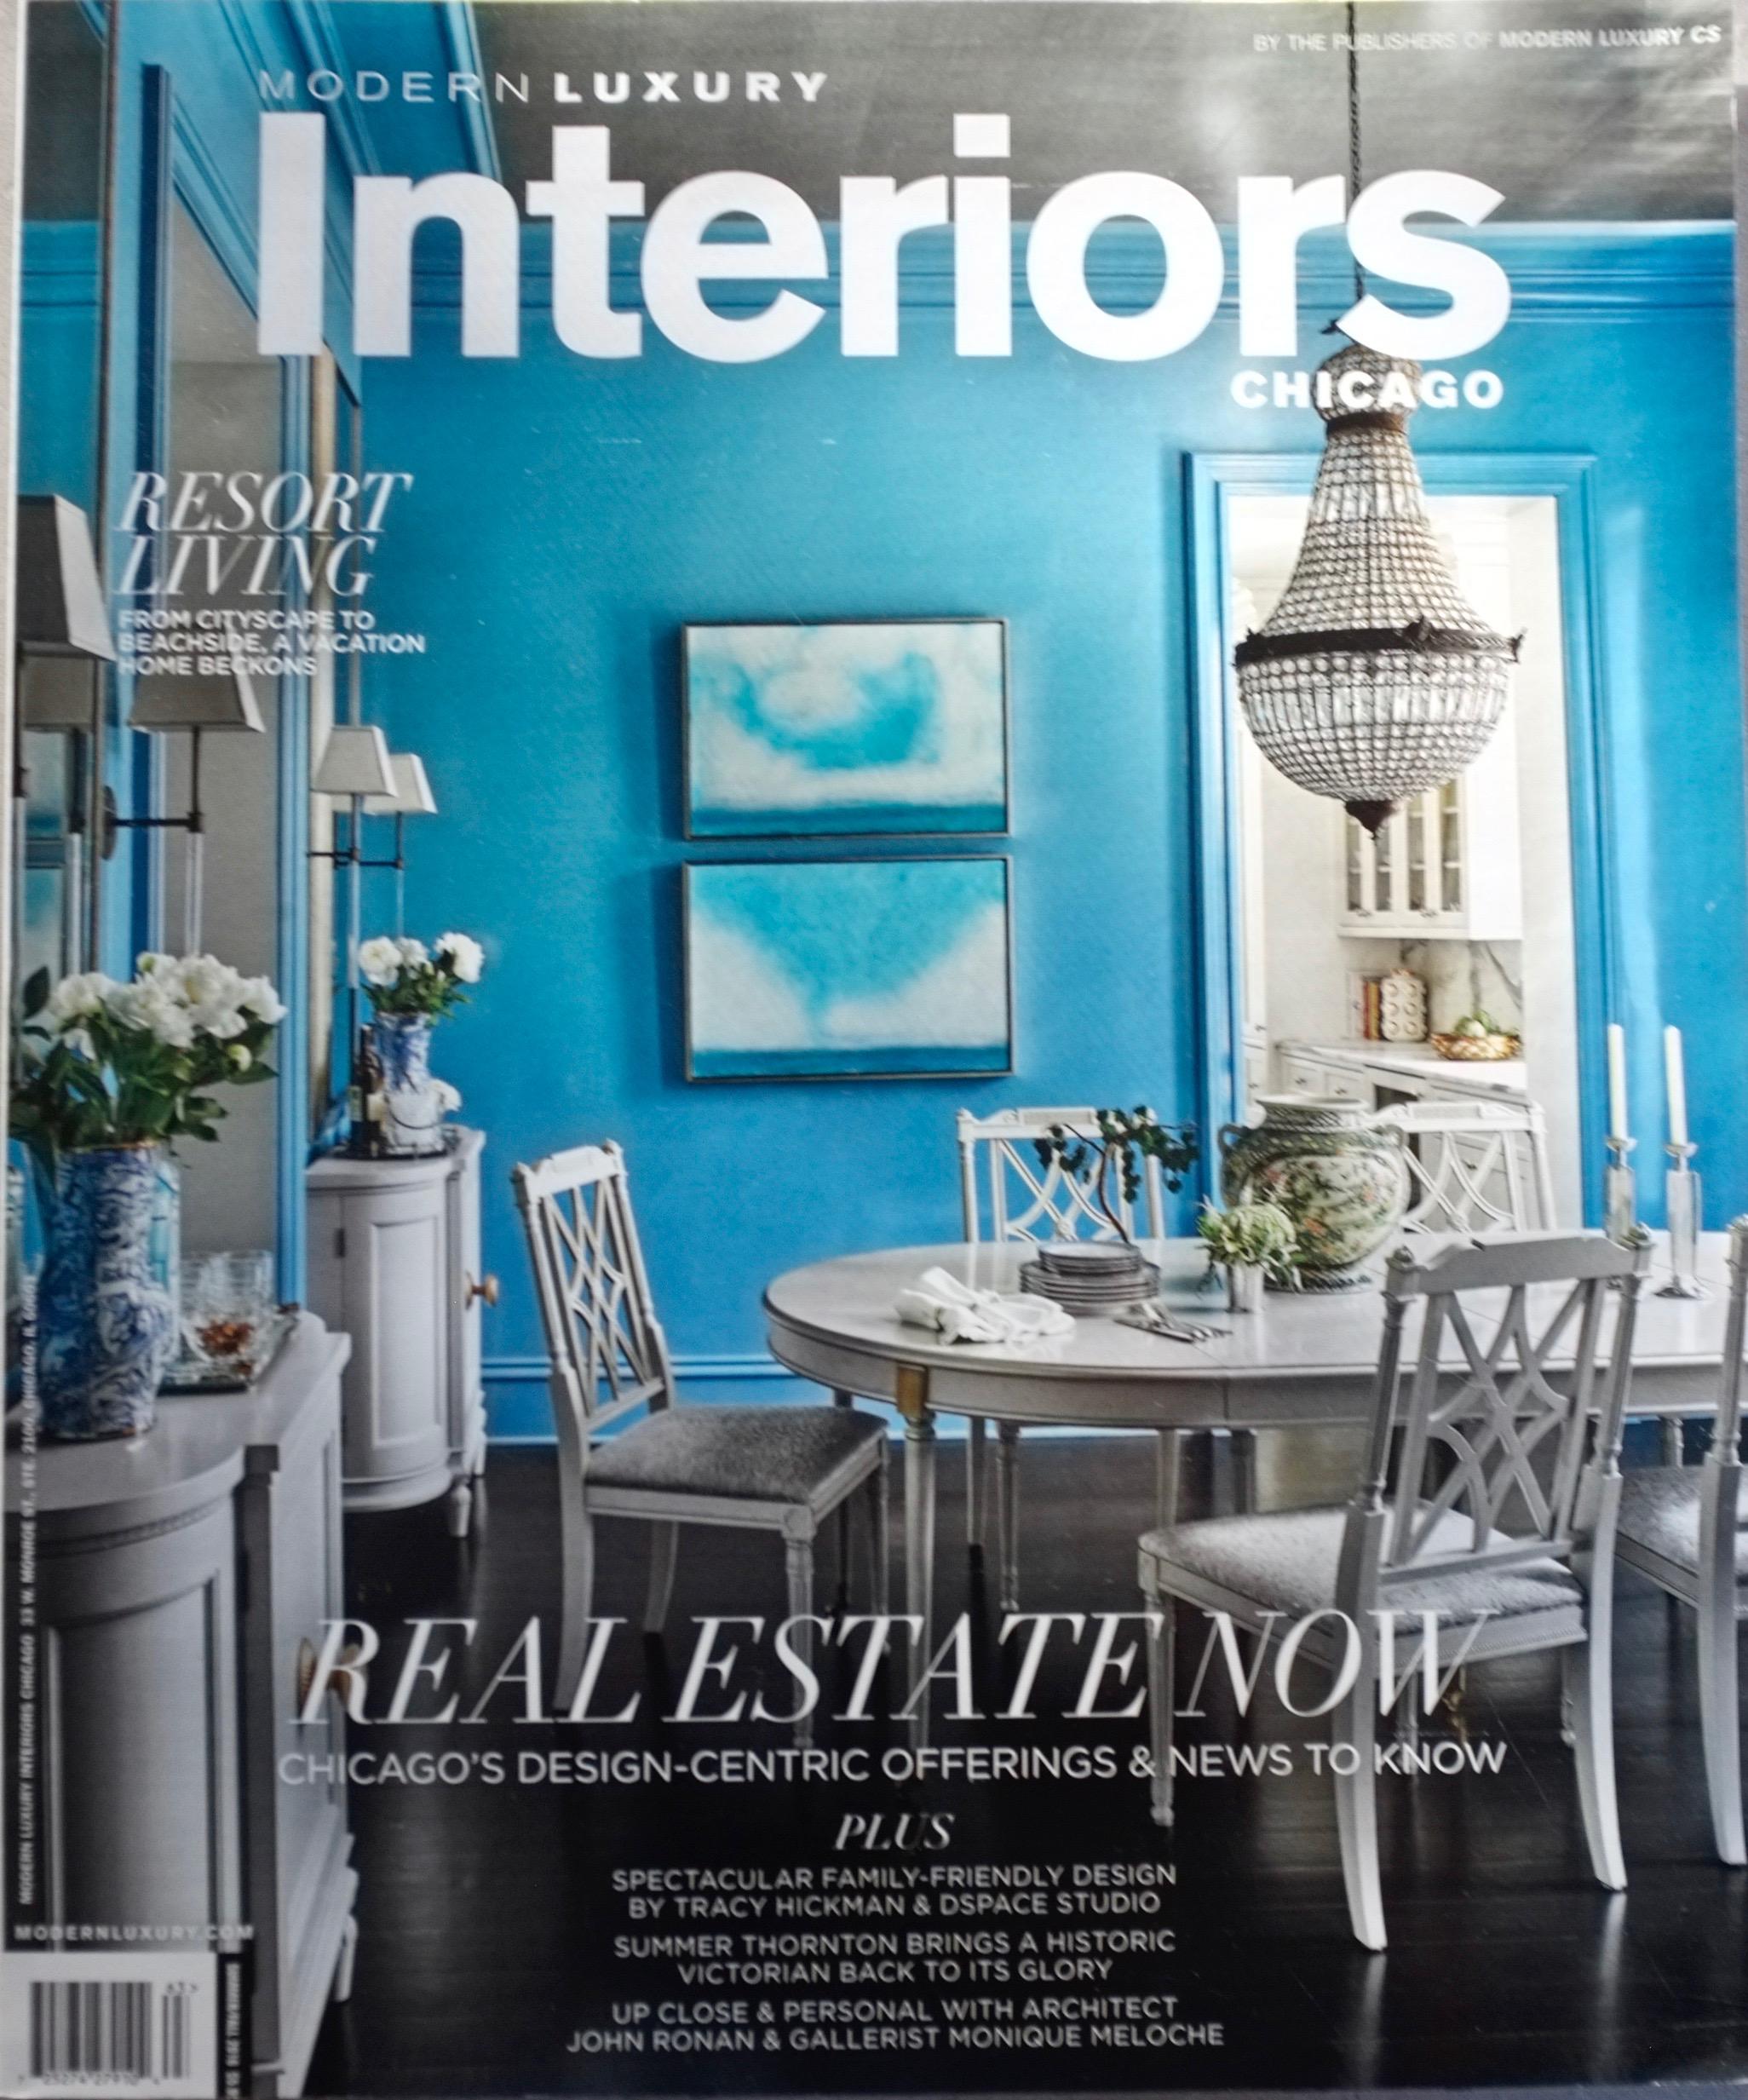 Modern Luxury Interiors - Summer/Fall 2016